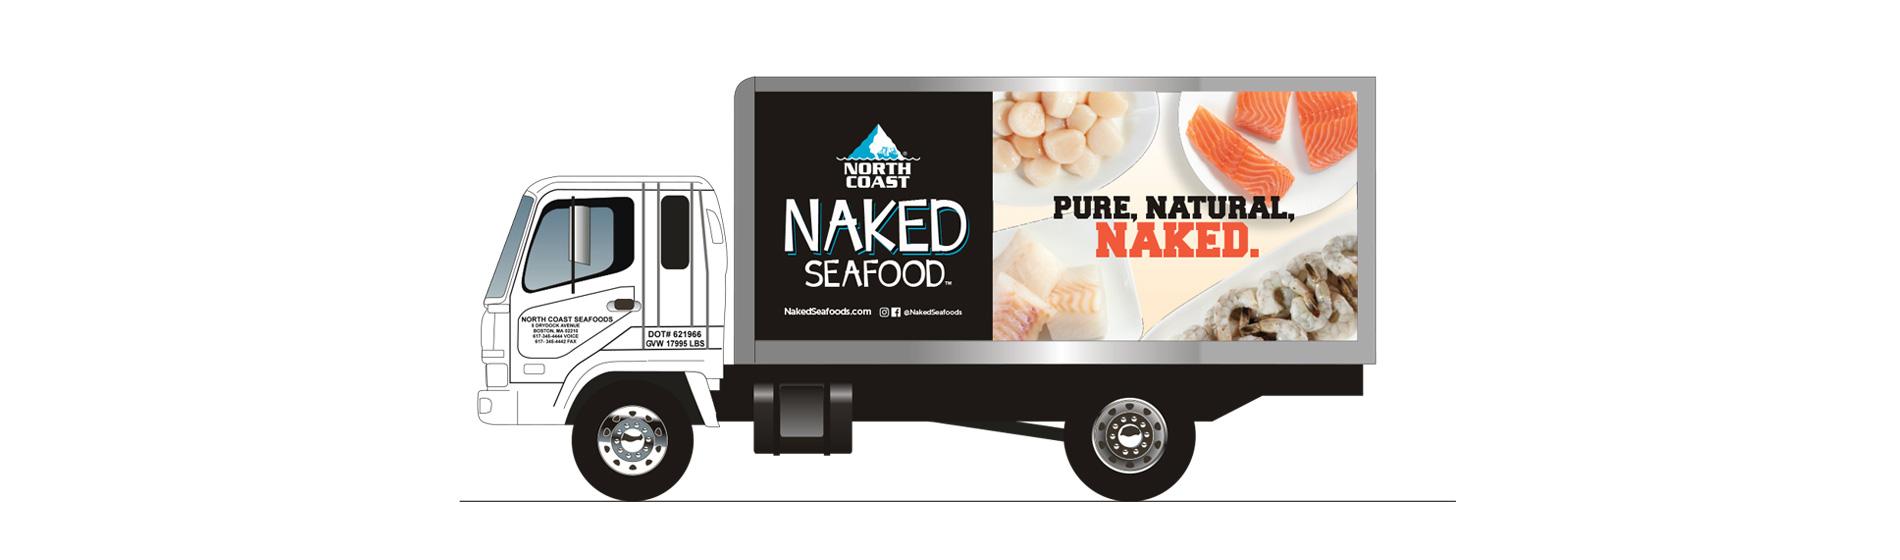 North Coast Naked Truck